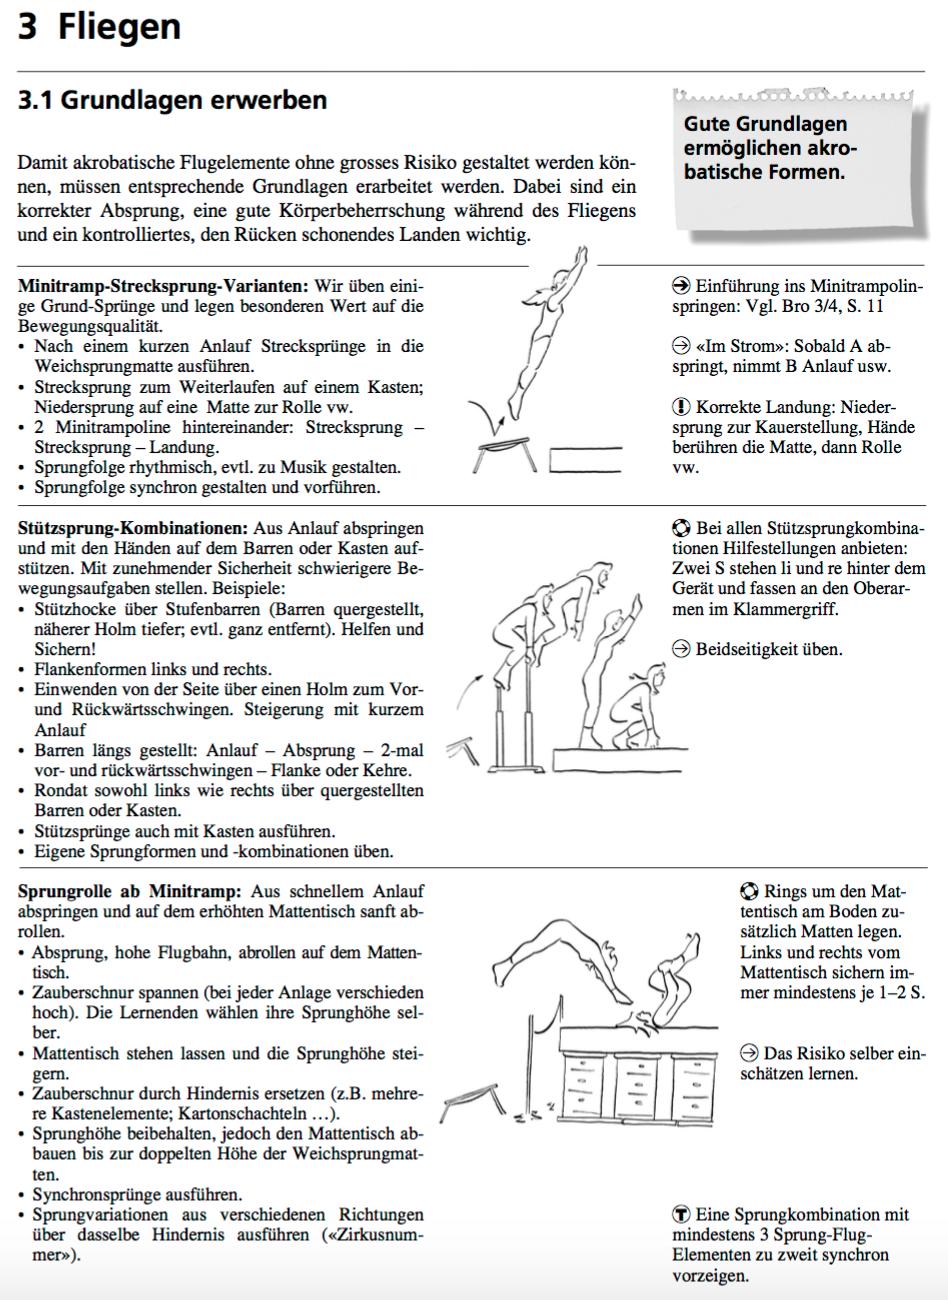 Preview image for LOM object Fliegen - Grundlagen Absprung, Flug, Landung